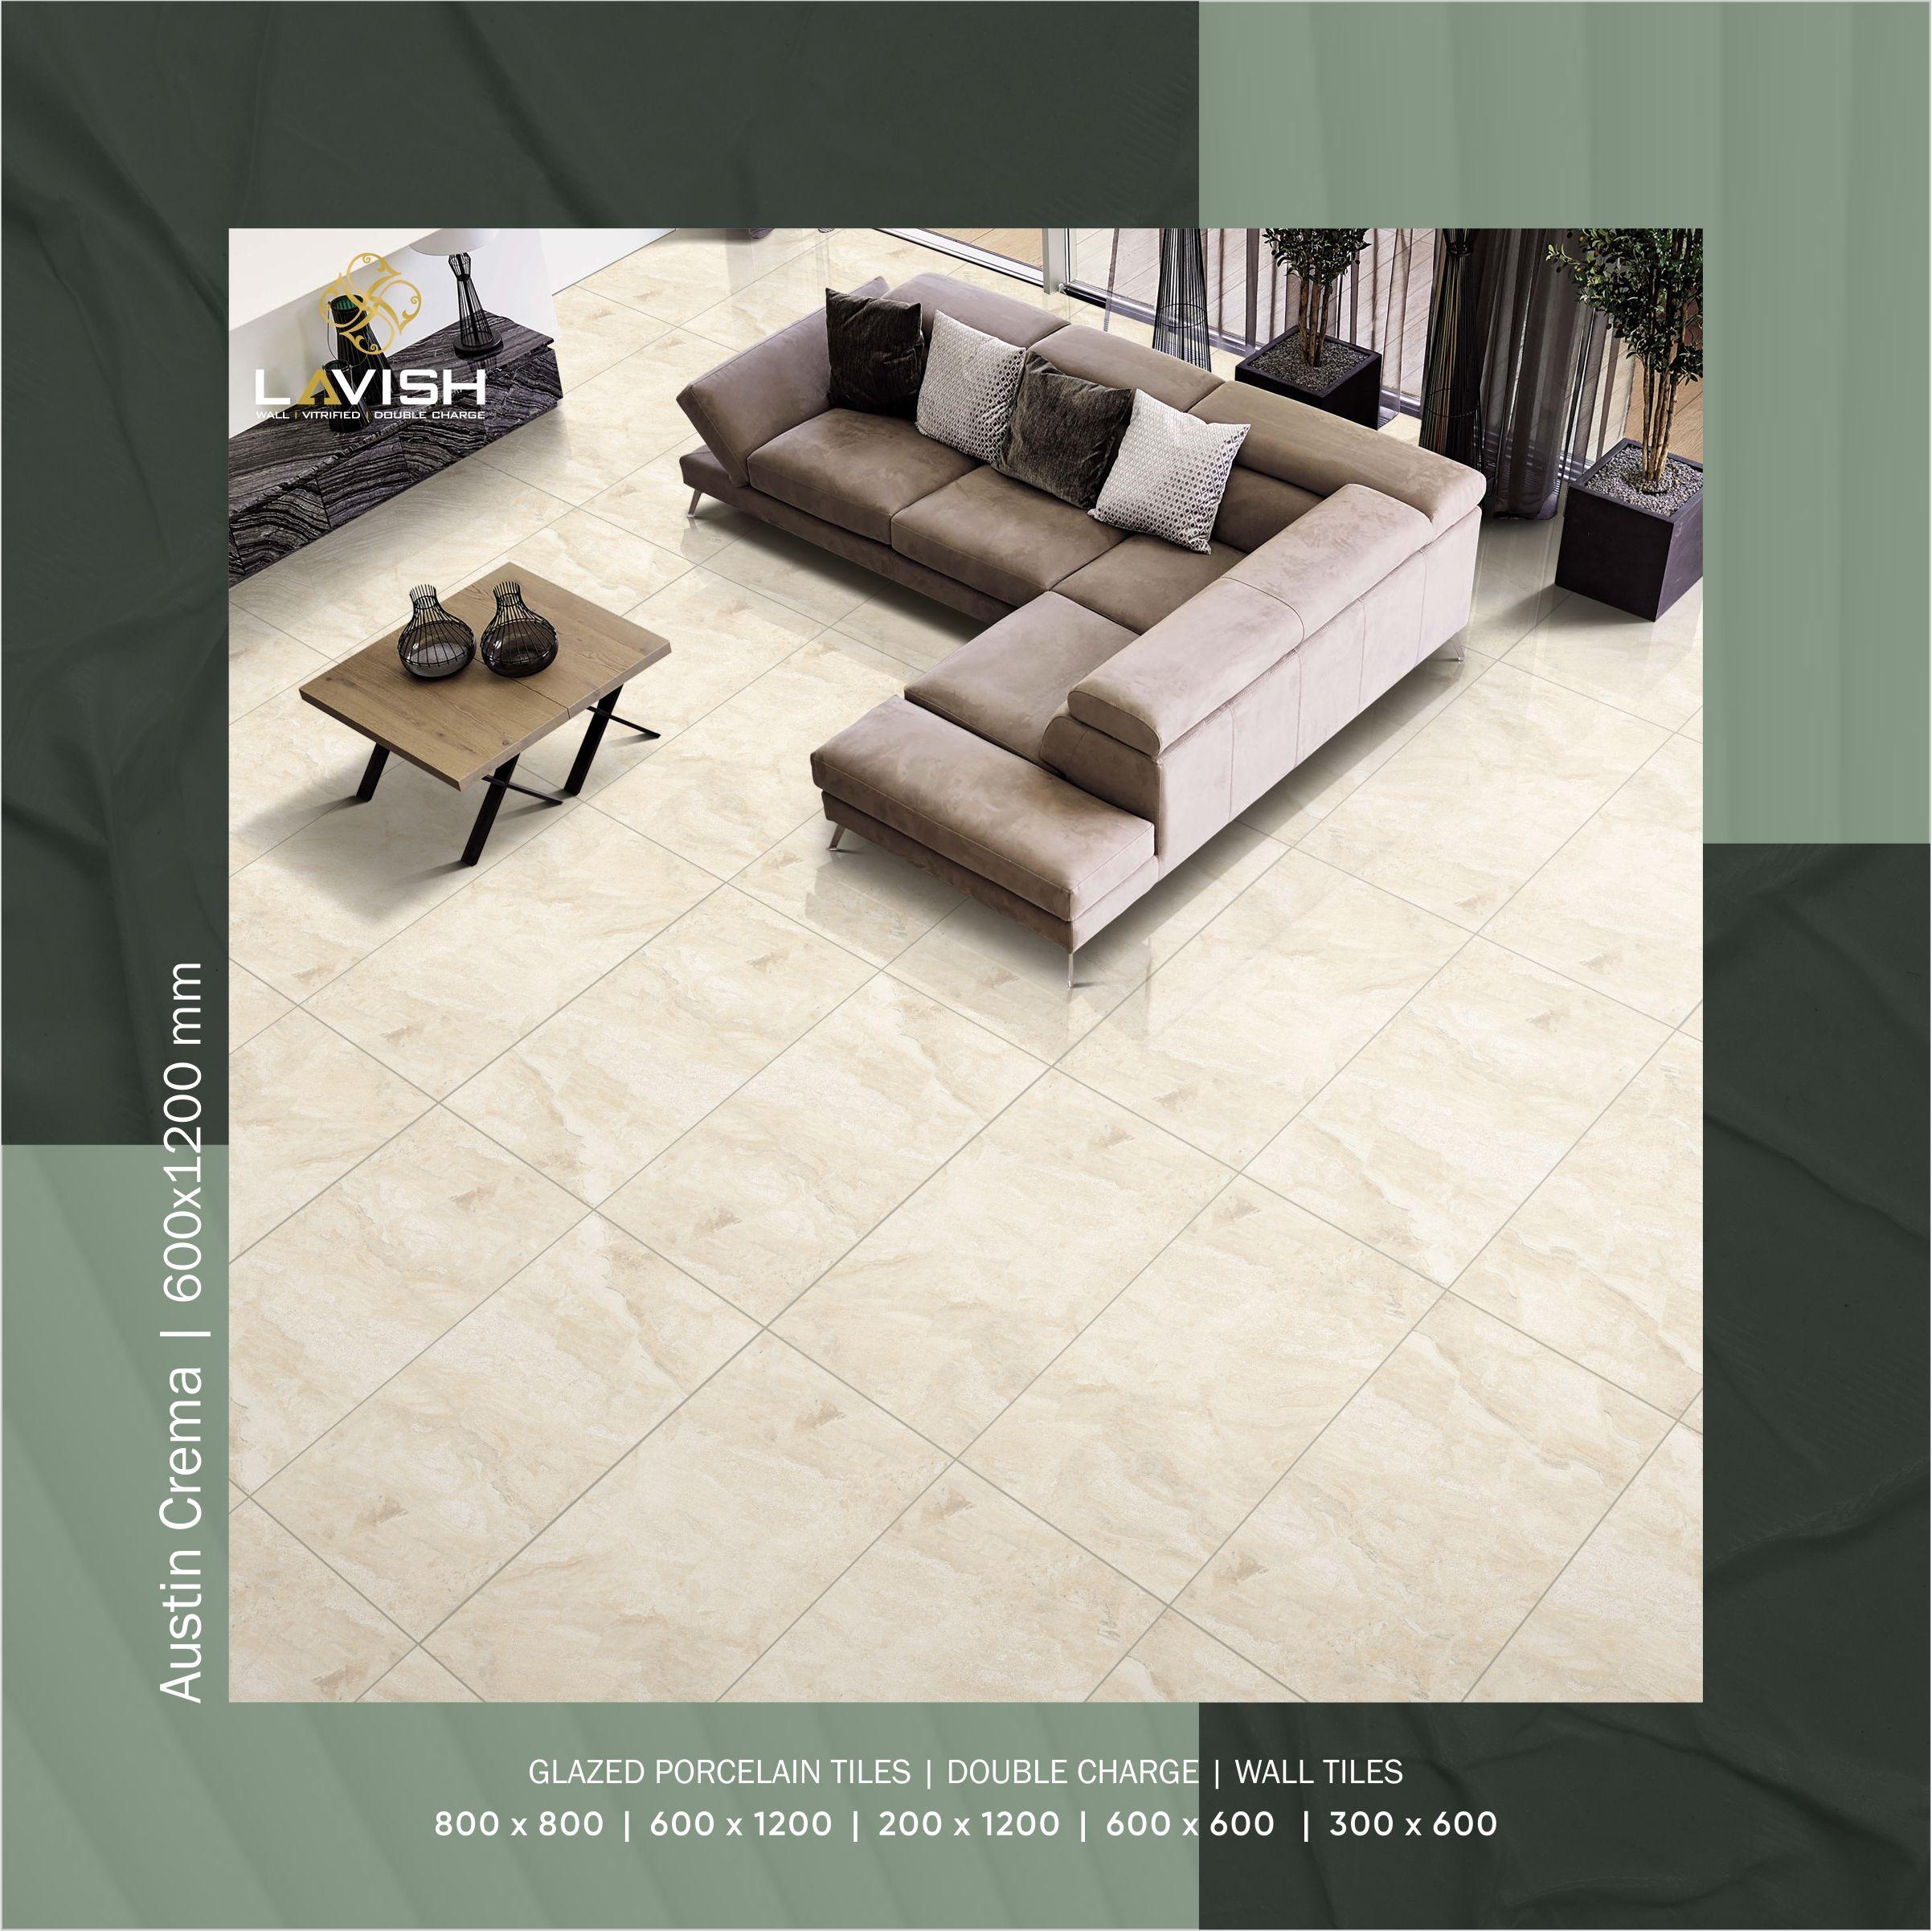 Lavish Ceramics Presents 600x1200mm Austin Crema Glazed Porcelain Tiles Tile Manufacturers Tiles Room Tiles